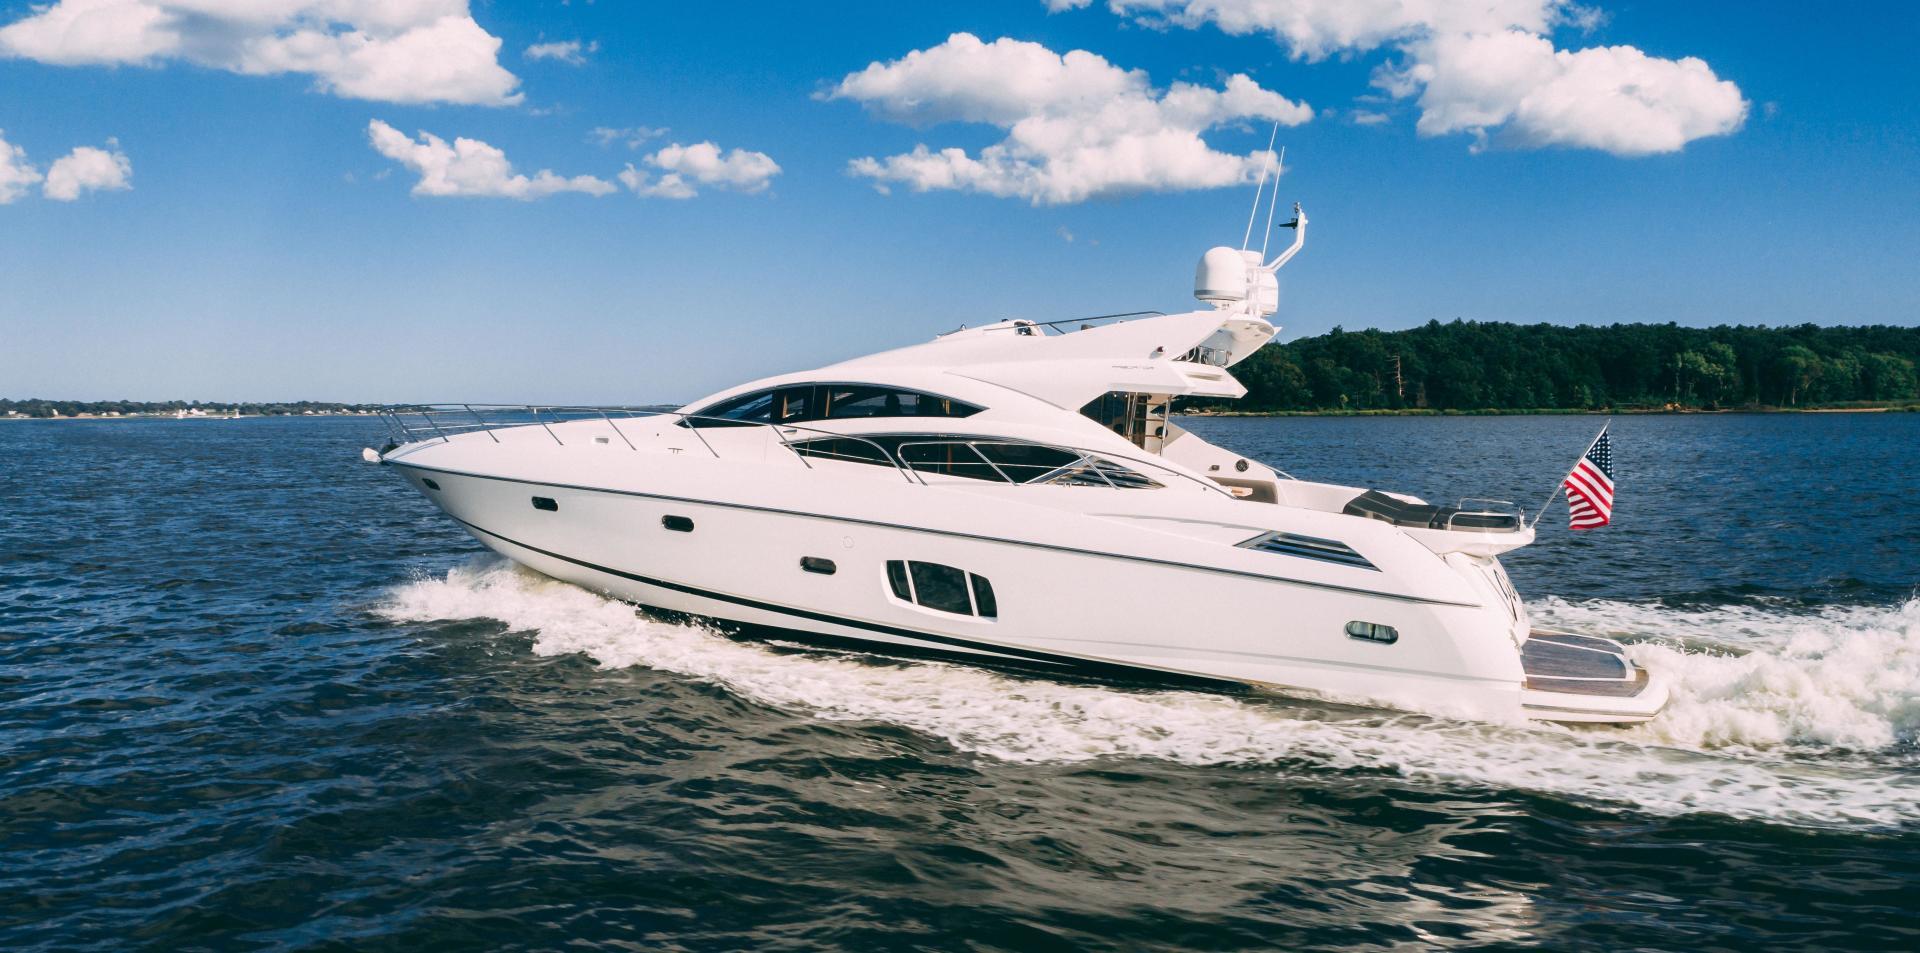 Sunseeker-Motor yacht 2012-JIMBO New Port-Rhode Island-United States-1480123   Thumbnail